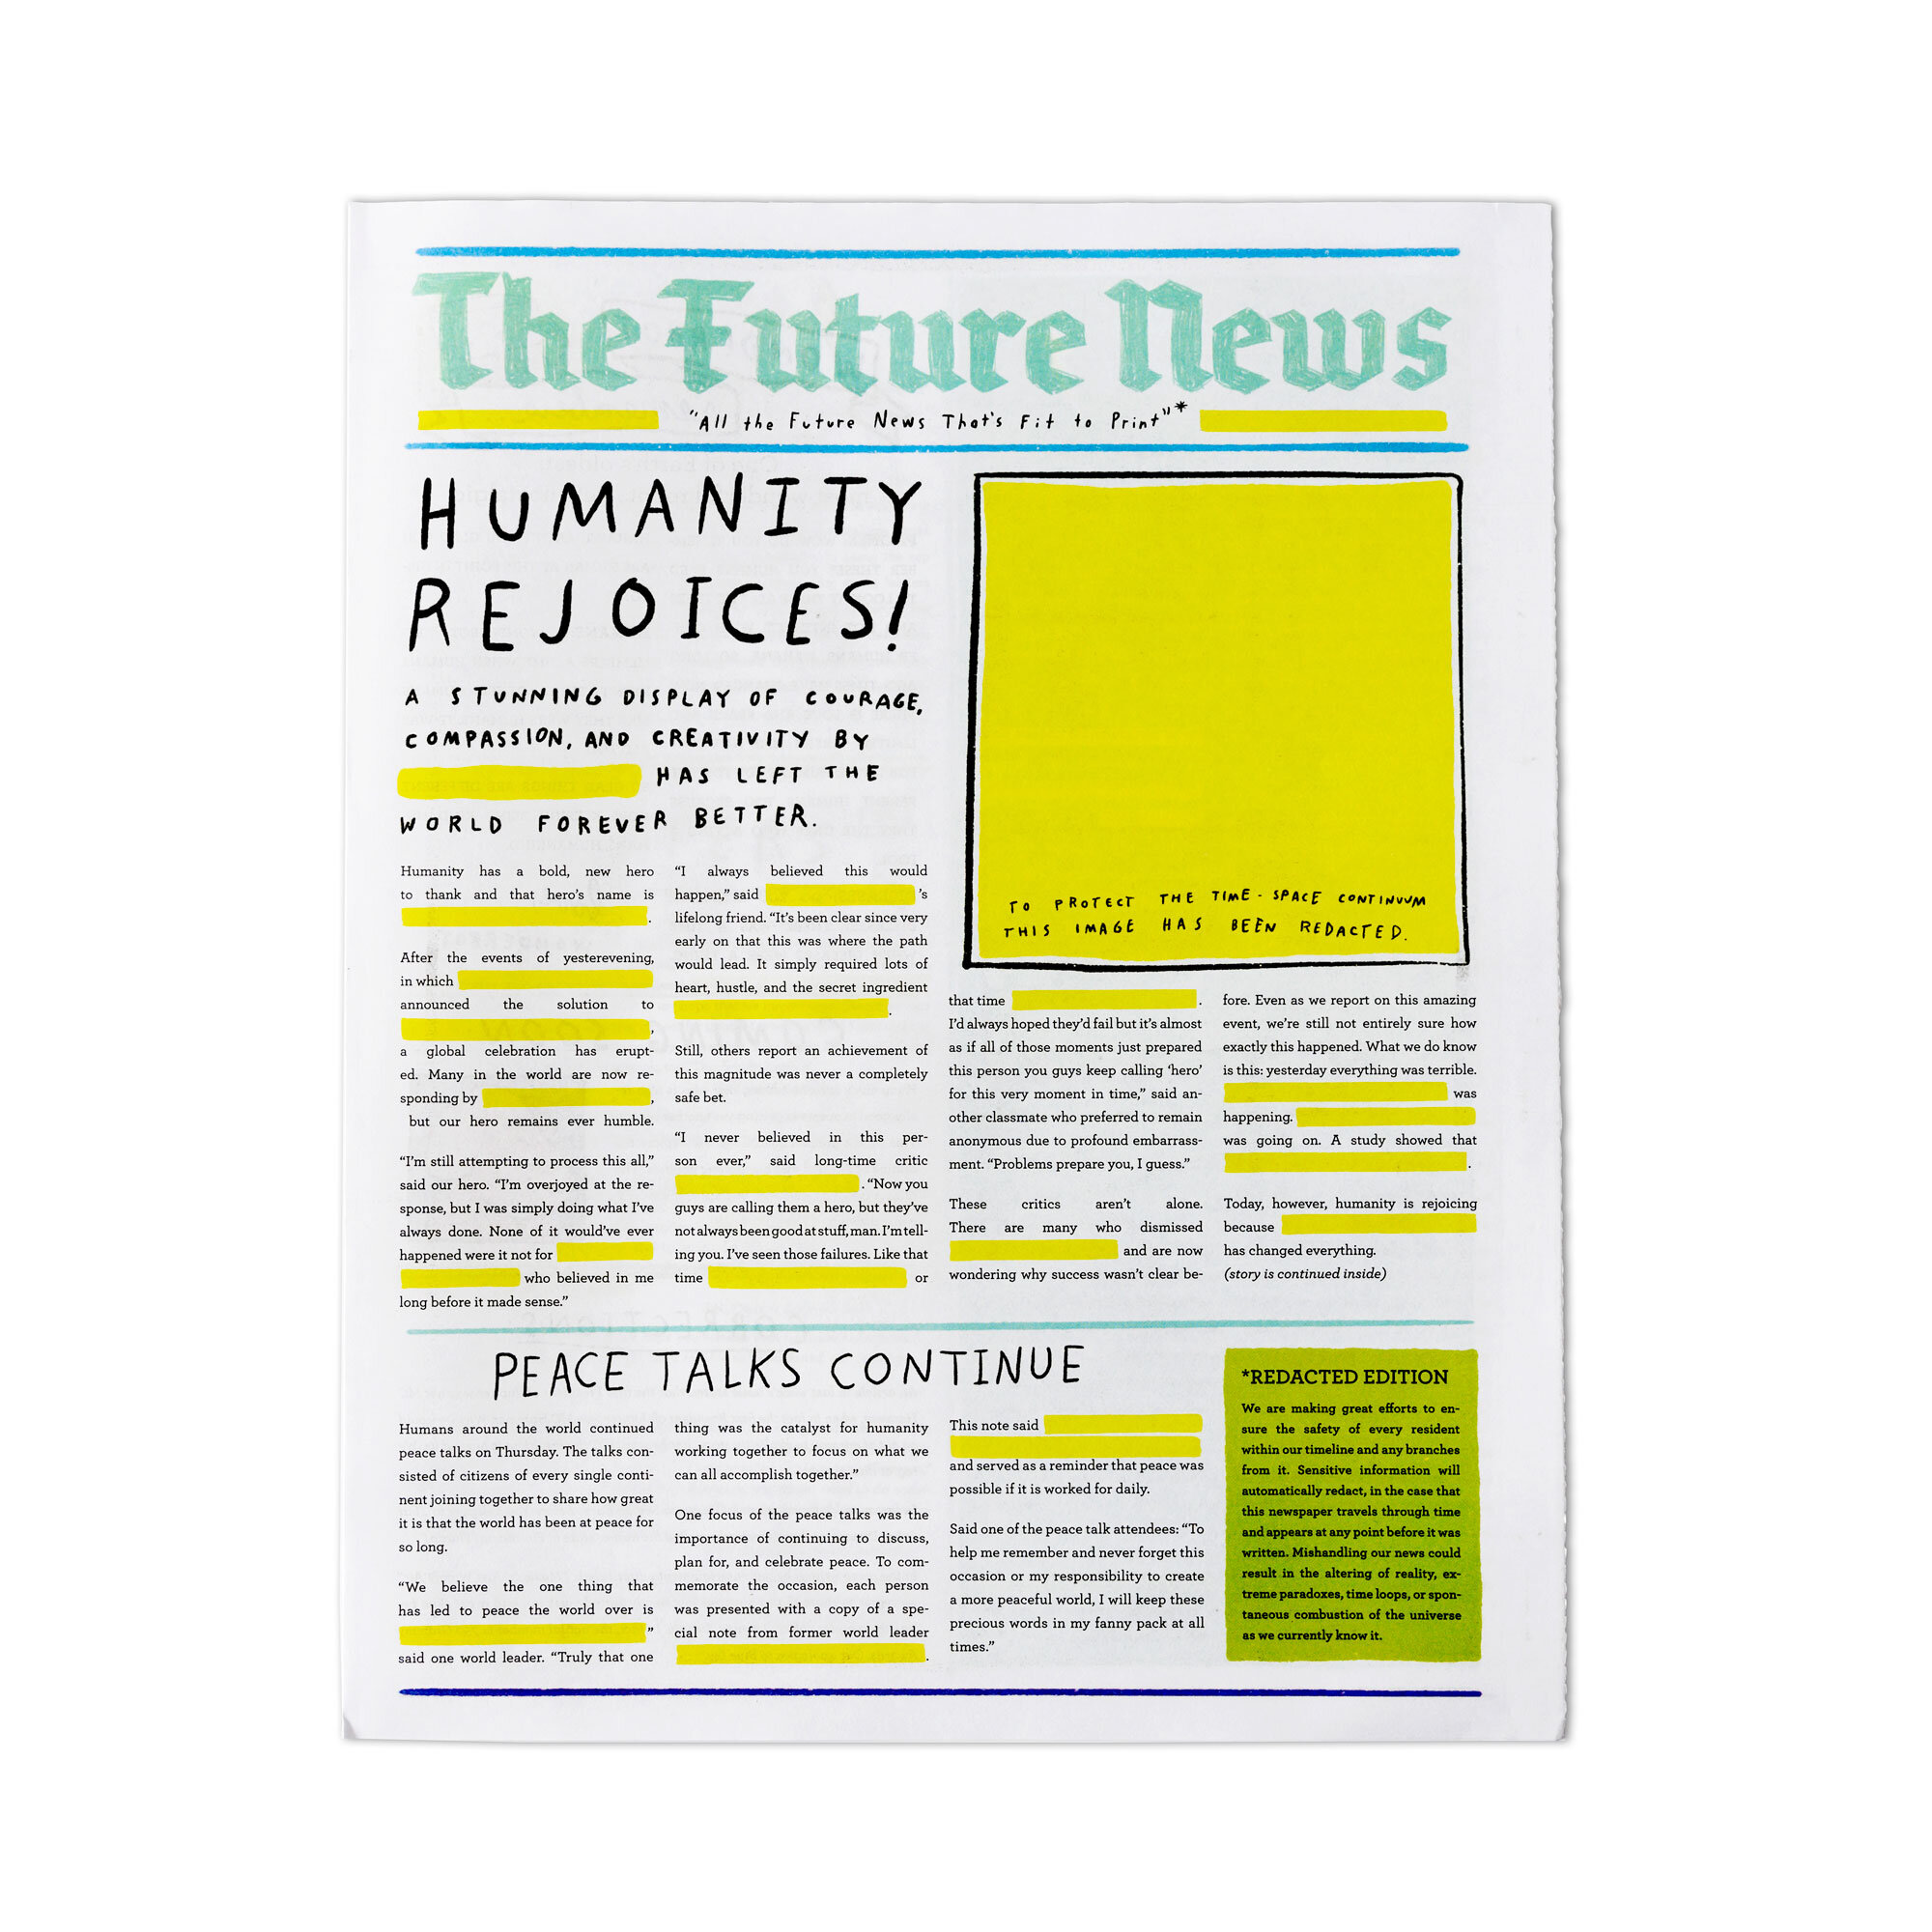 futurenews01.jpg